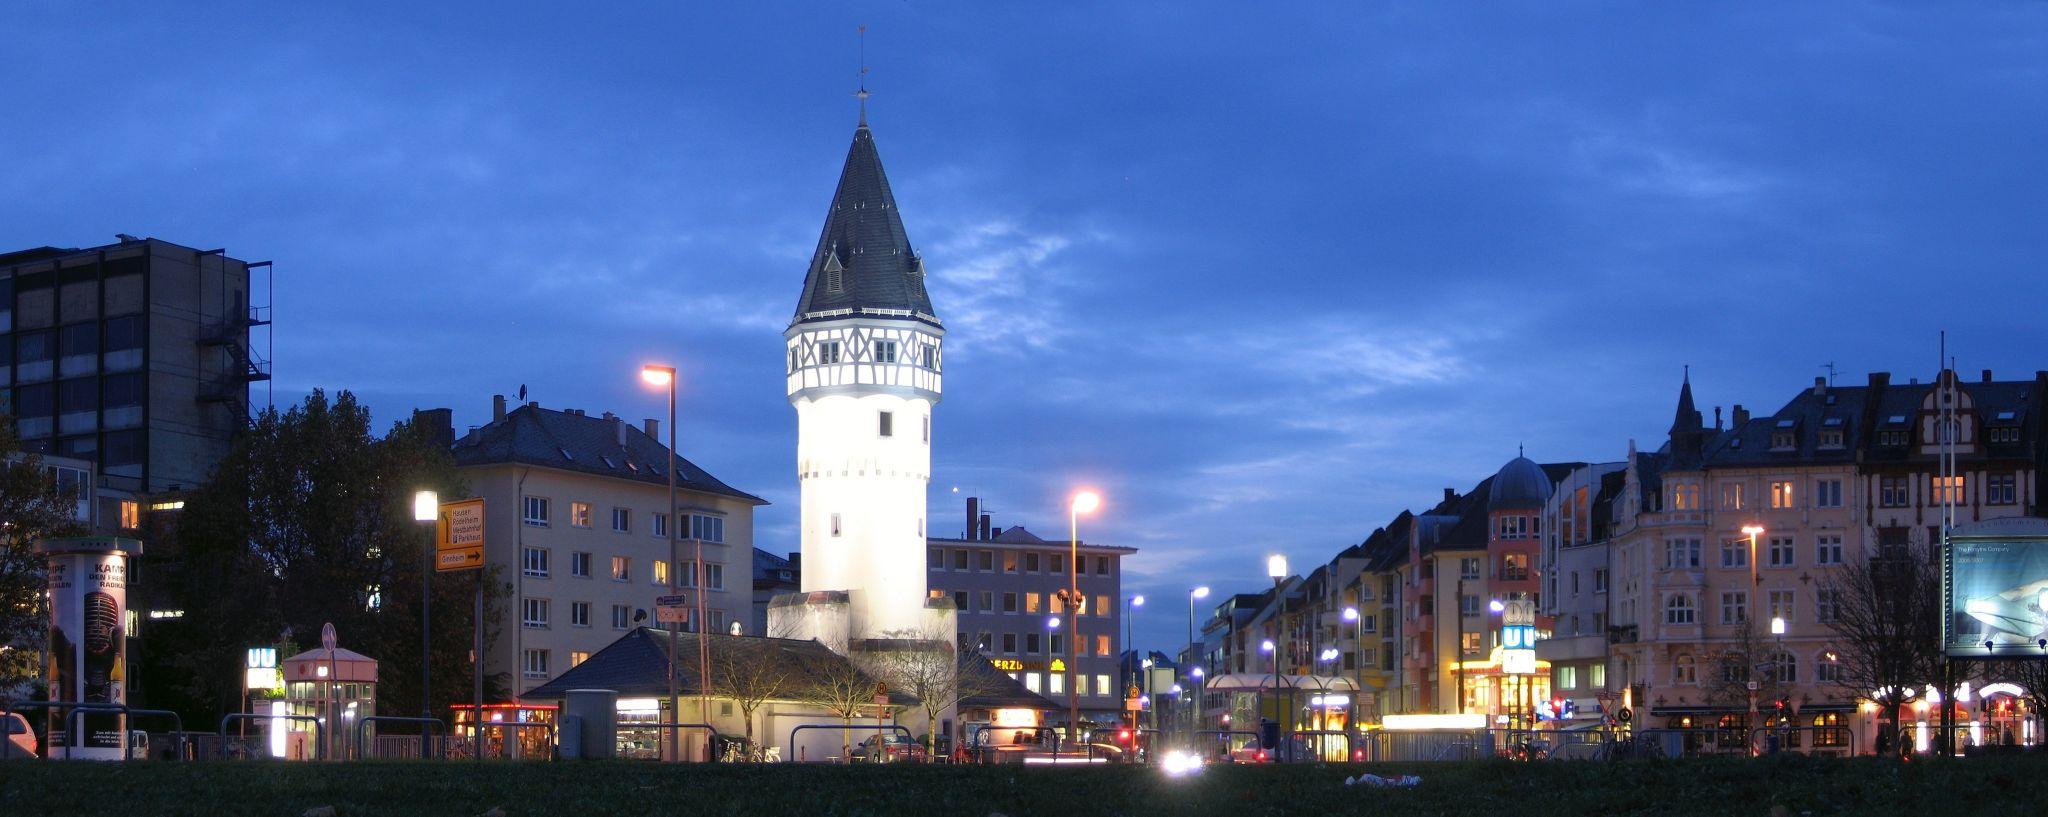 Hotels Near Frankfurt Main Station